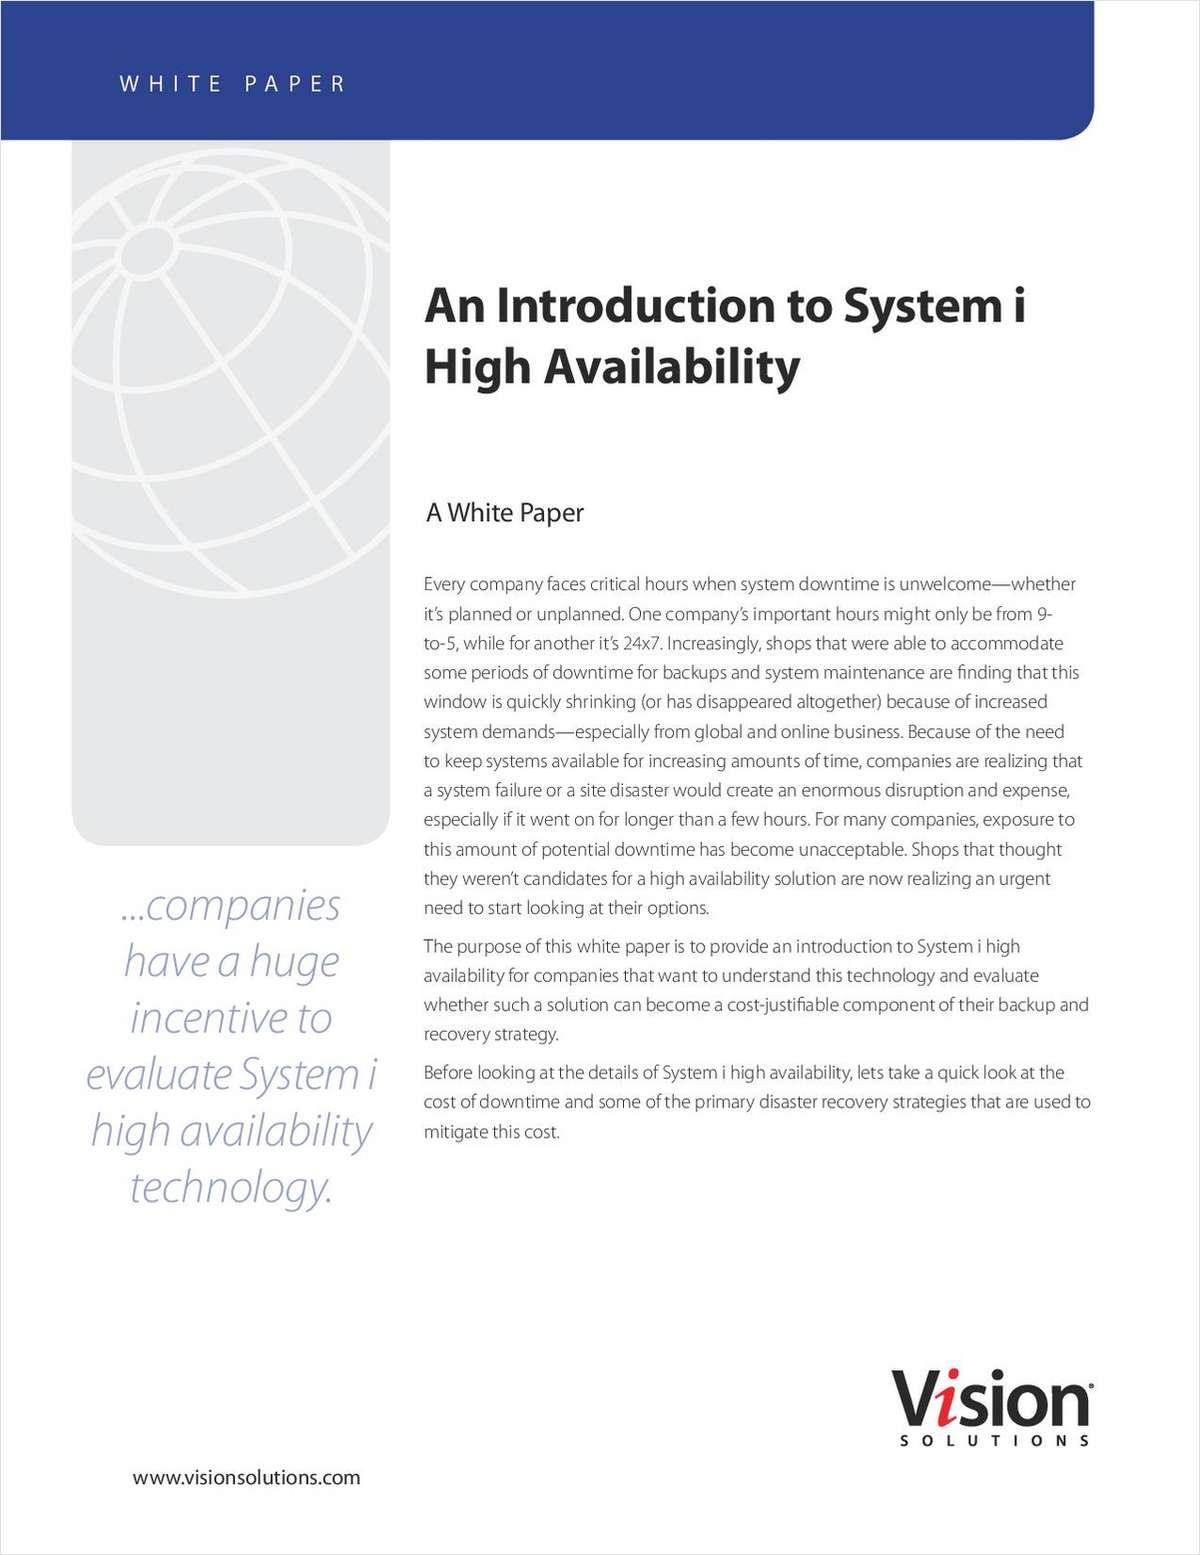 High Availability on IBM System i (AS/400) - An Introduction